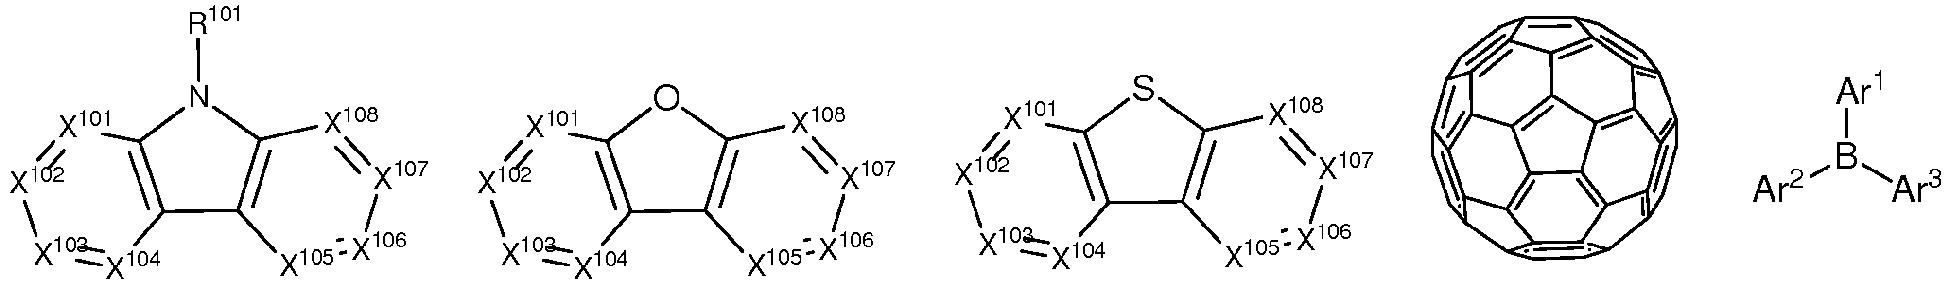 Figure imgb0940